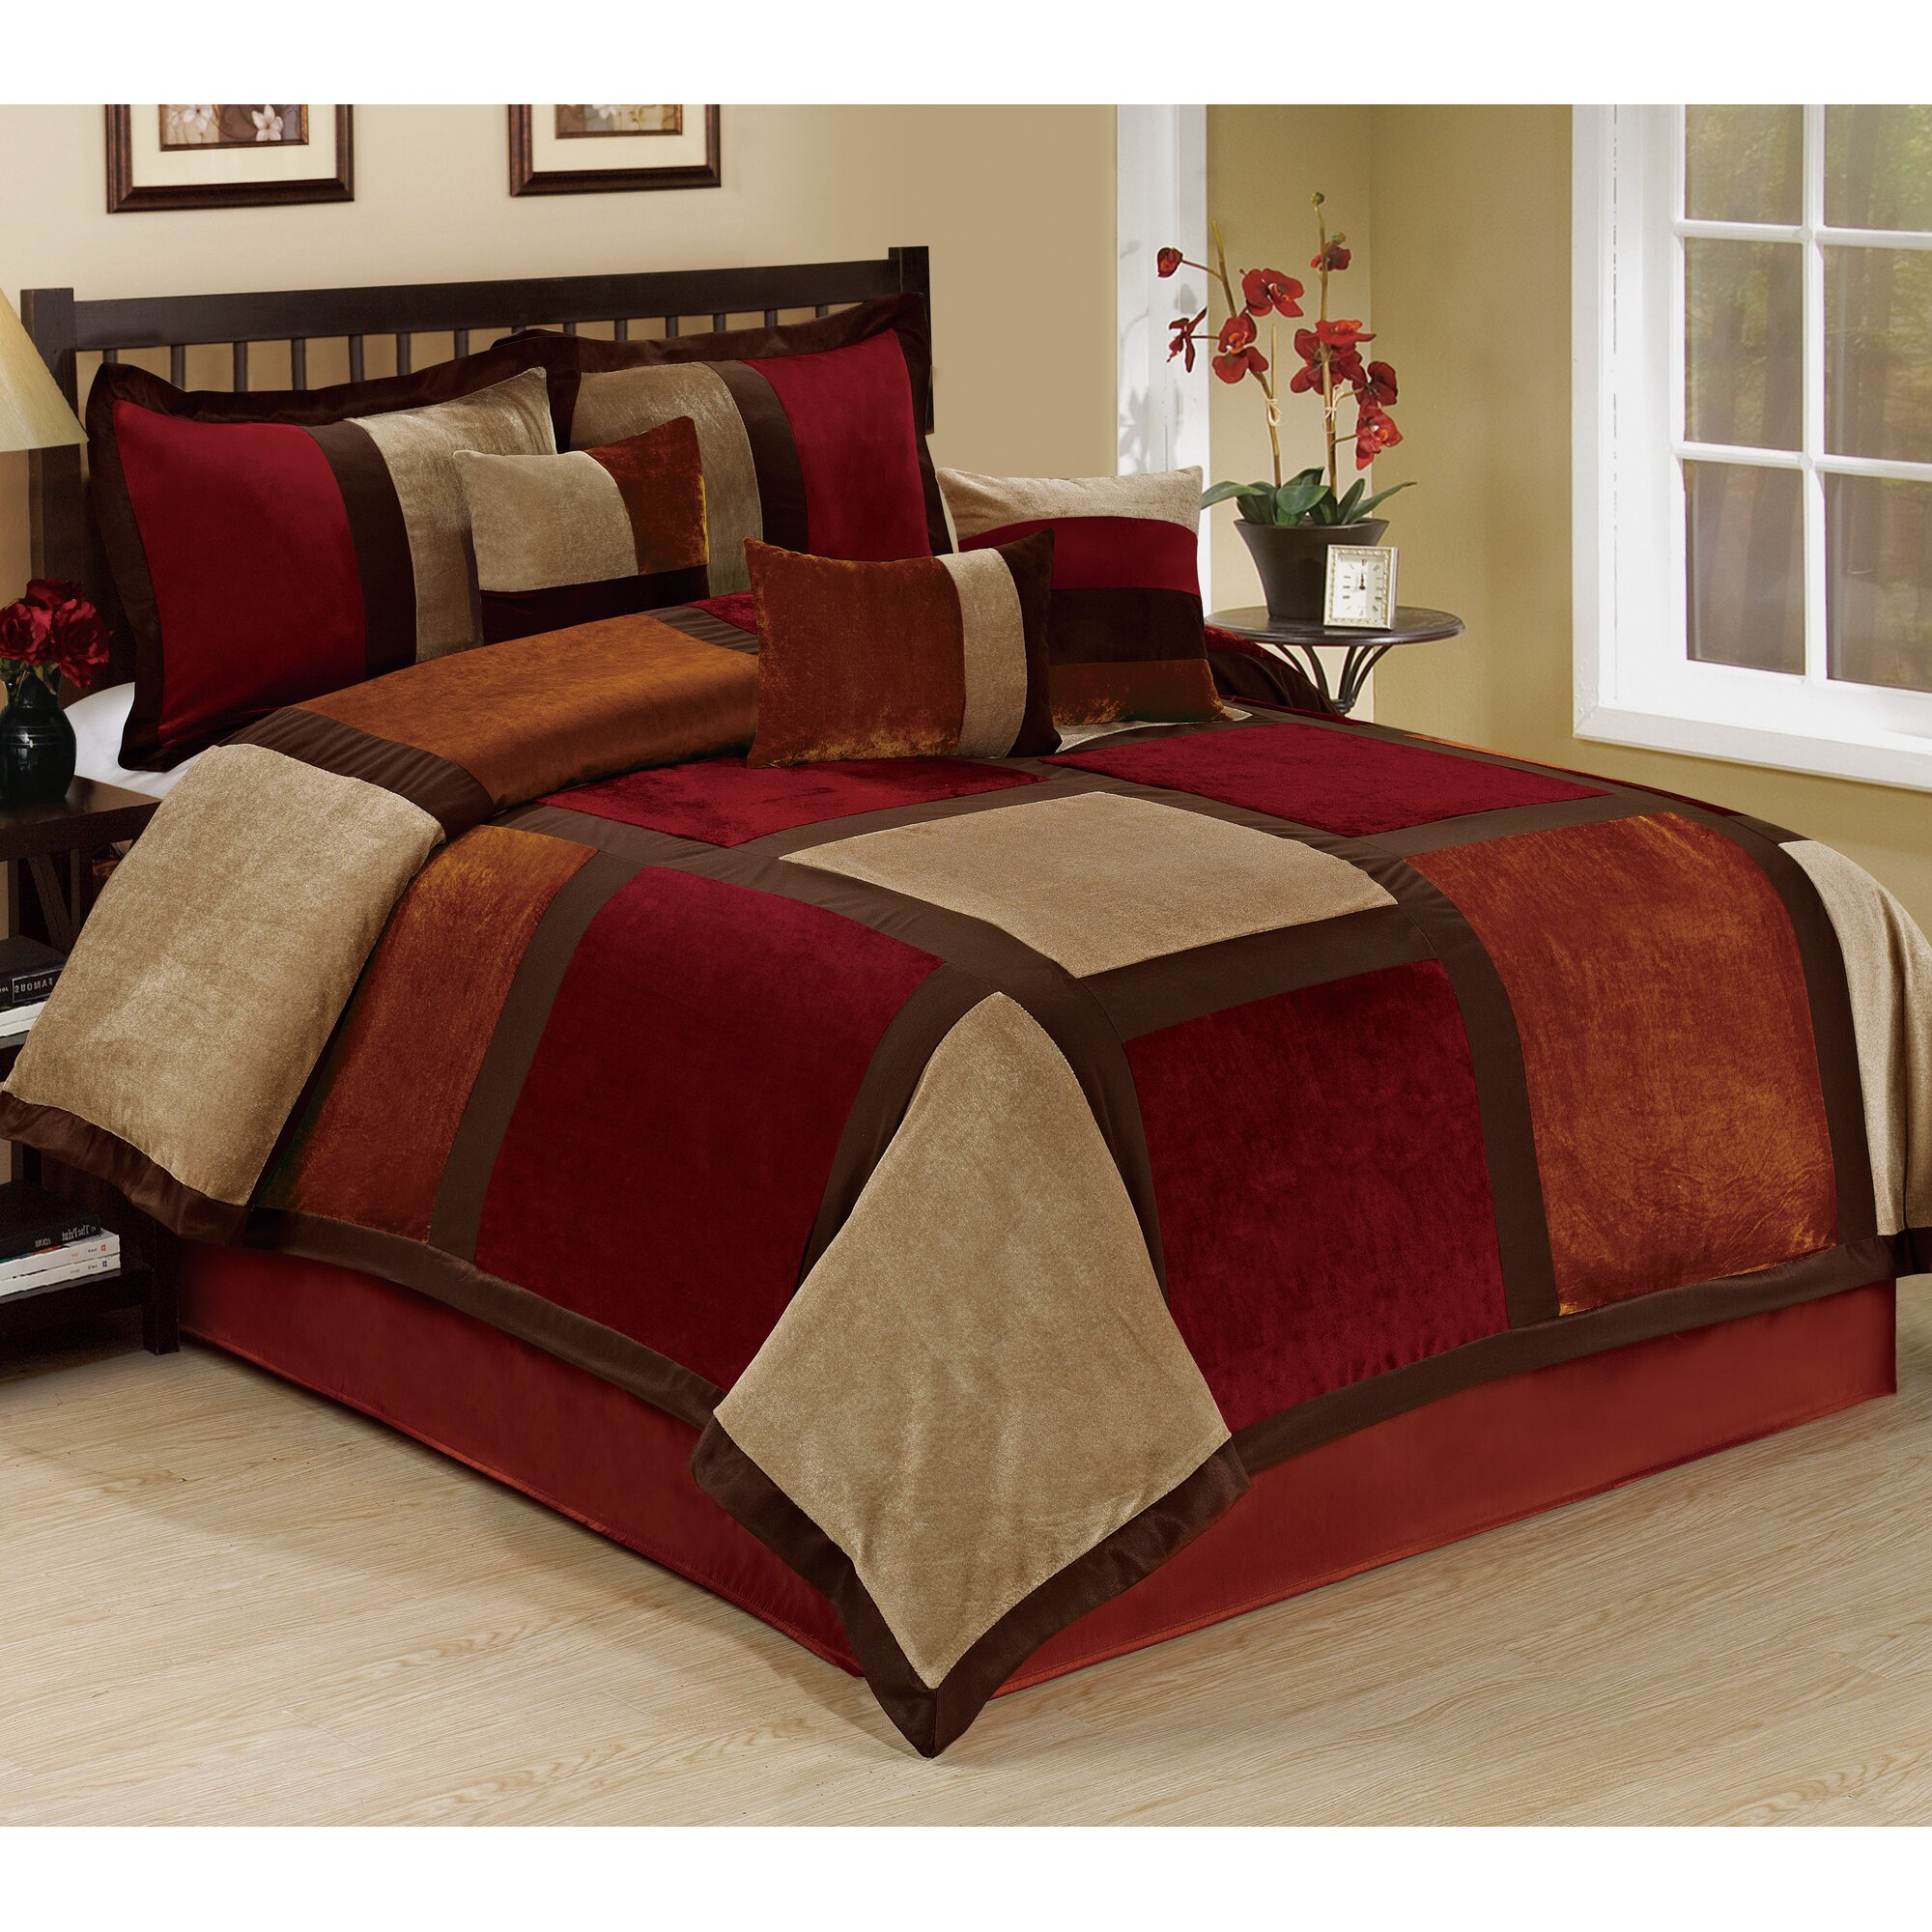 Homechoice International Group Spencer 7 Piece Comforter